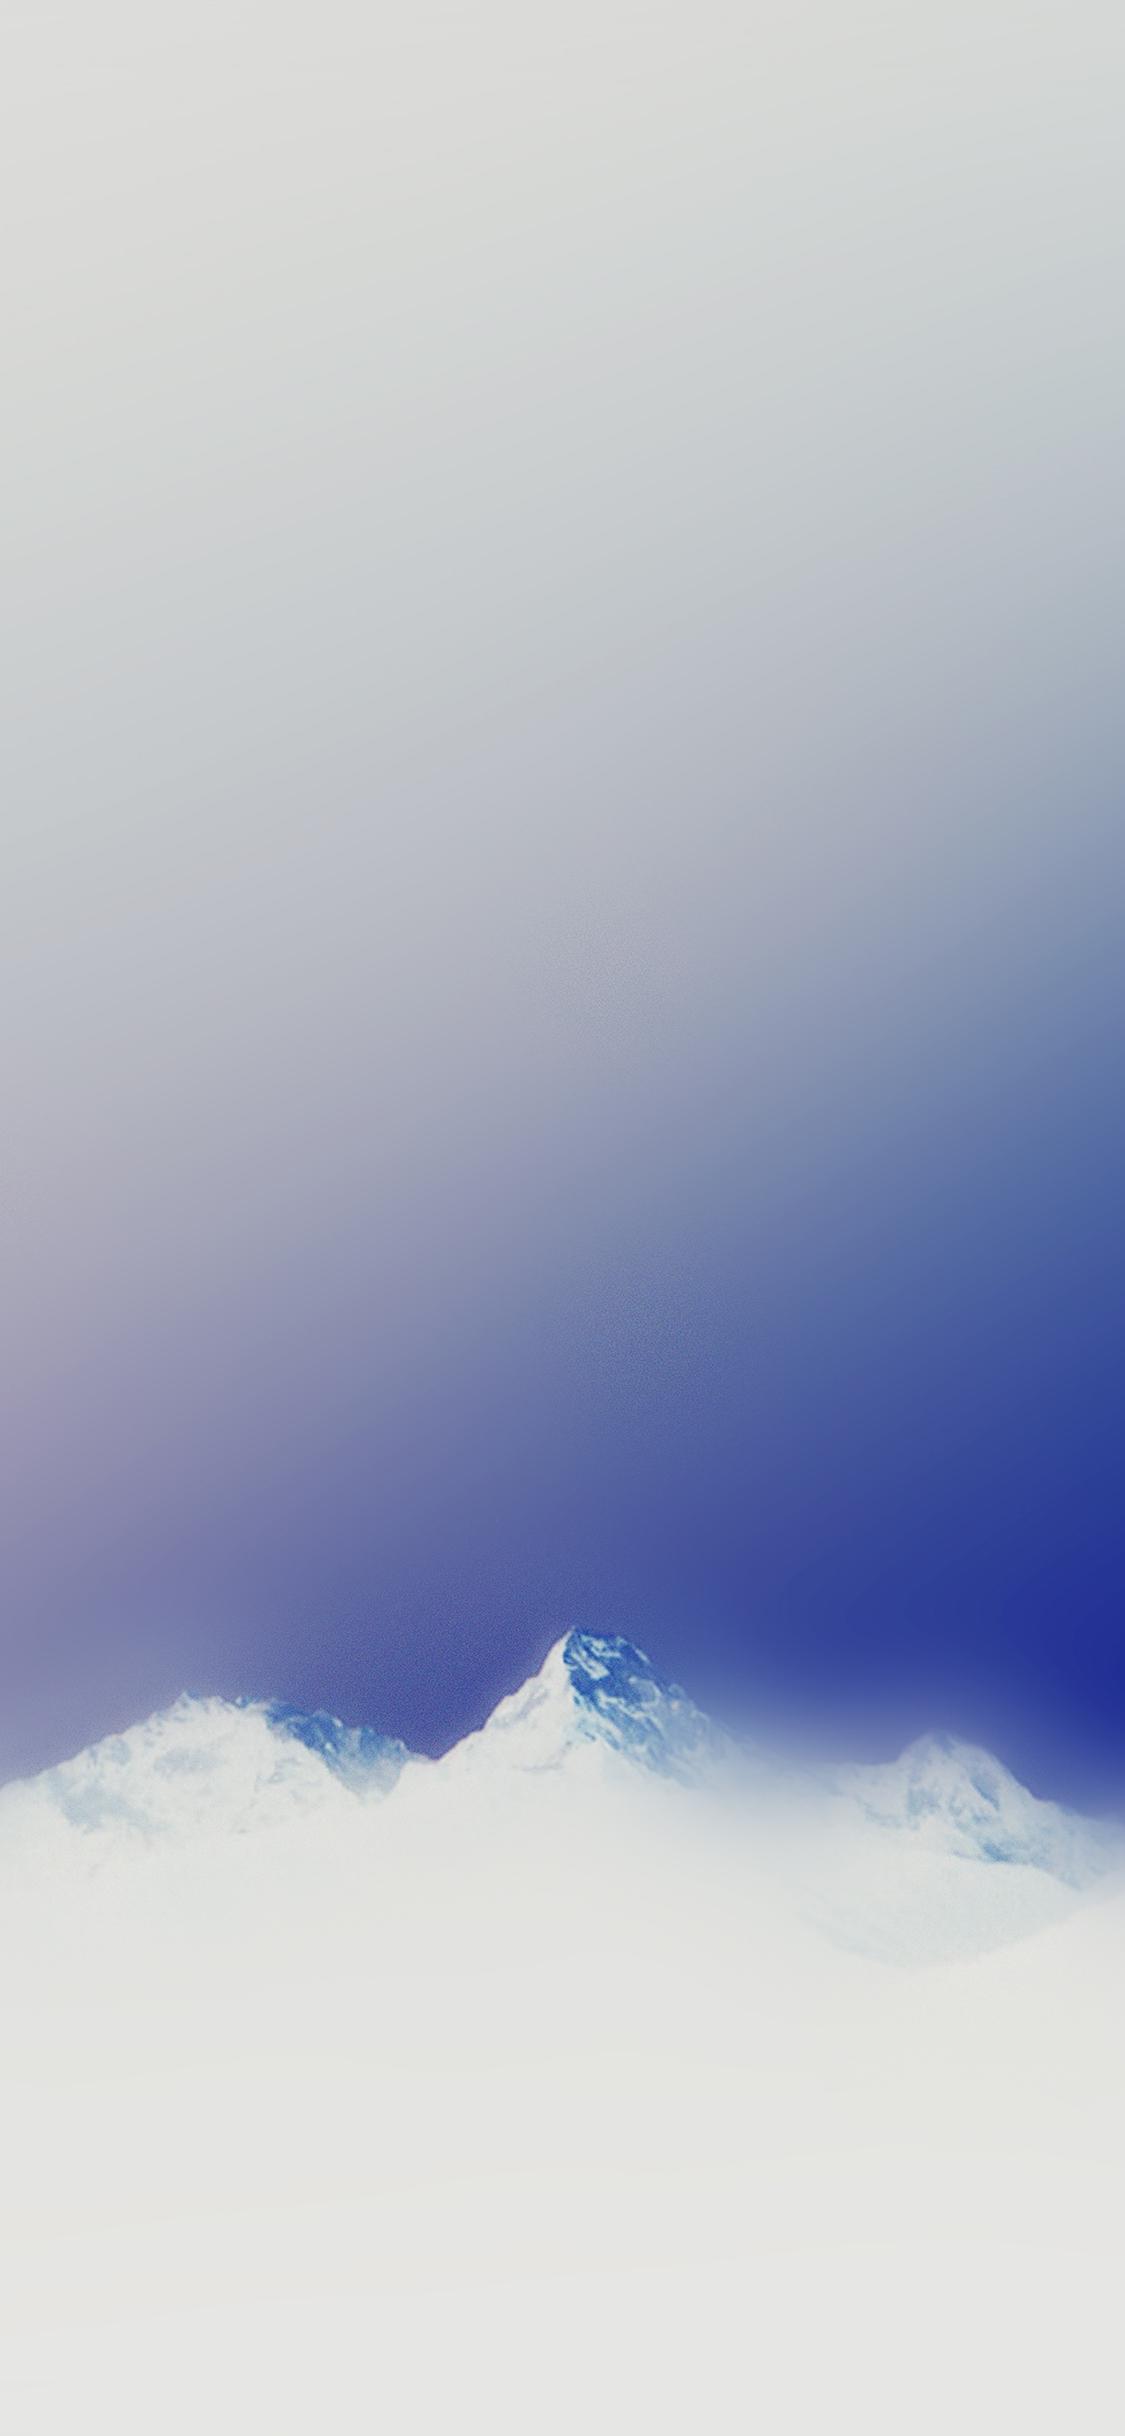 iPhonexpapers.com-Apple-iPhone-wallpaper-ml08-mountain-blur-blue-minimal-nature